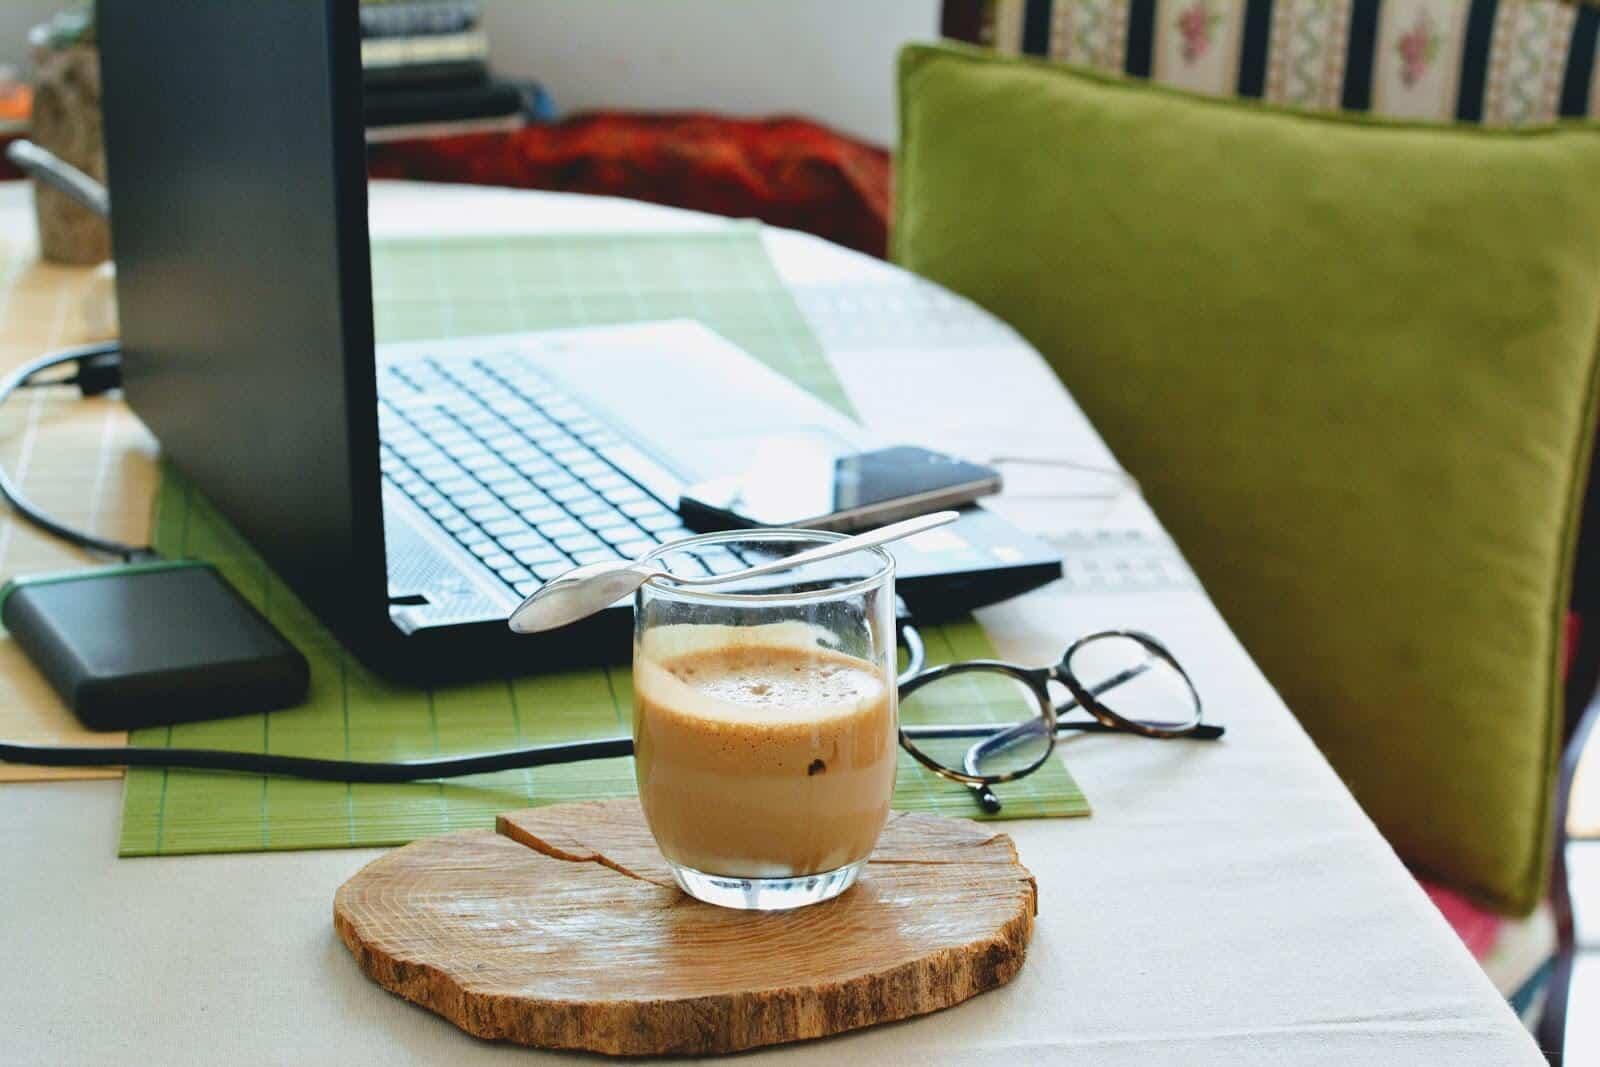 Legitimate work at home jobs: Setup of laptop, phone, coffee, and eyeglasses